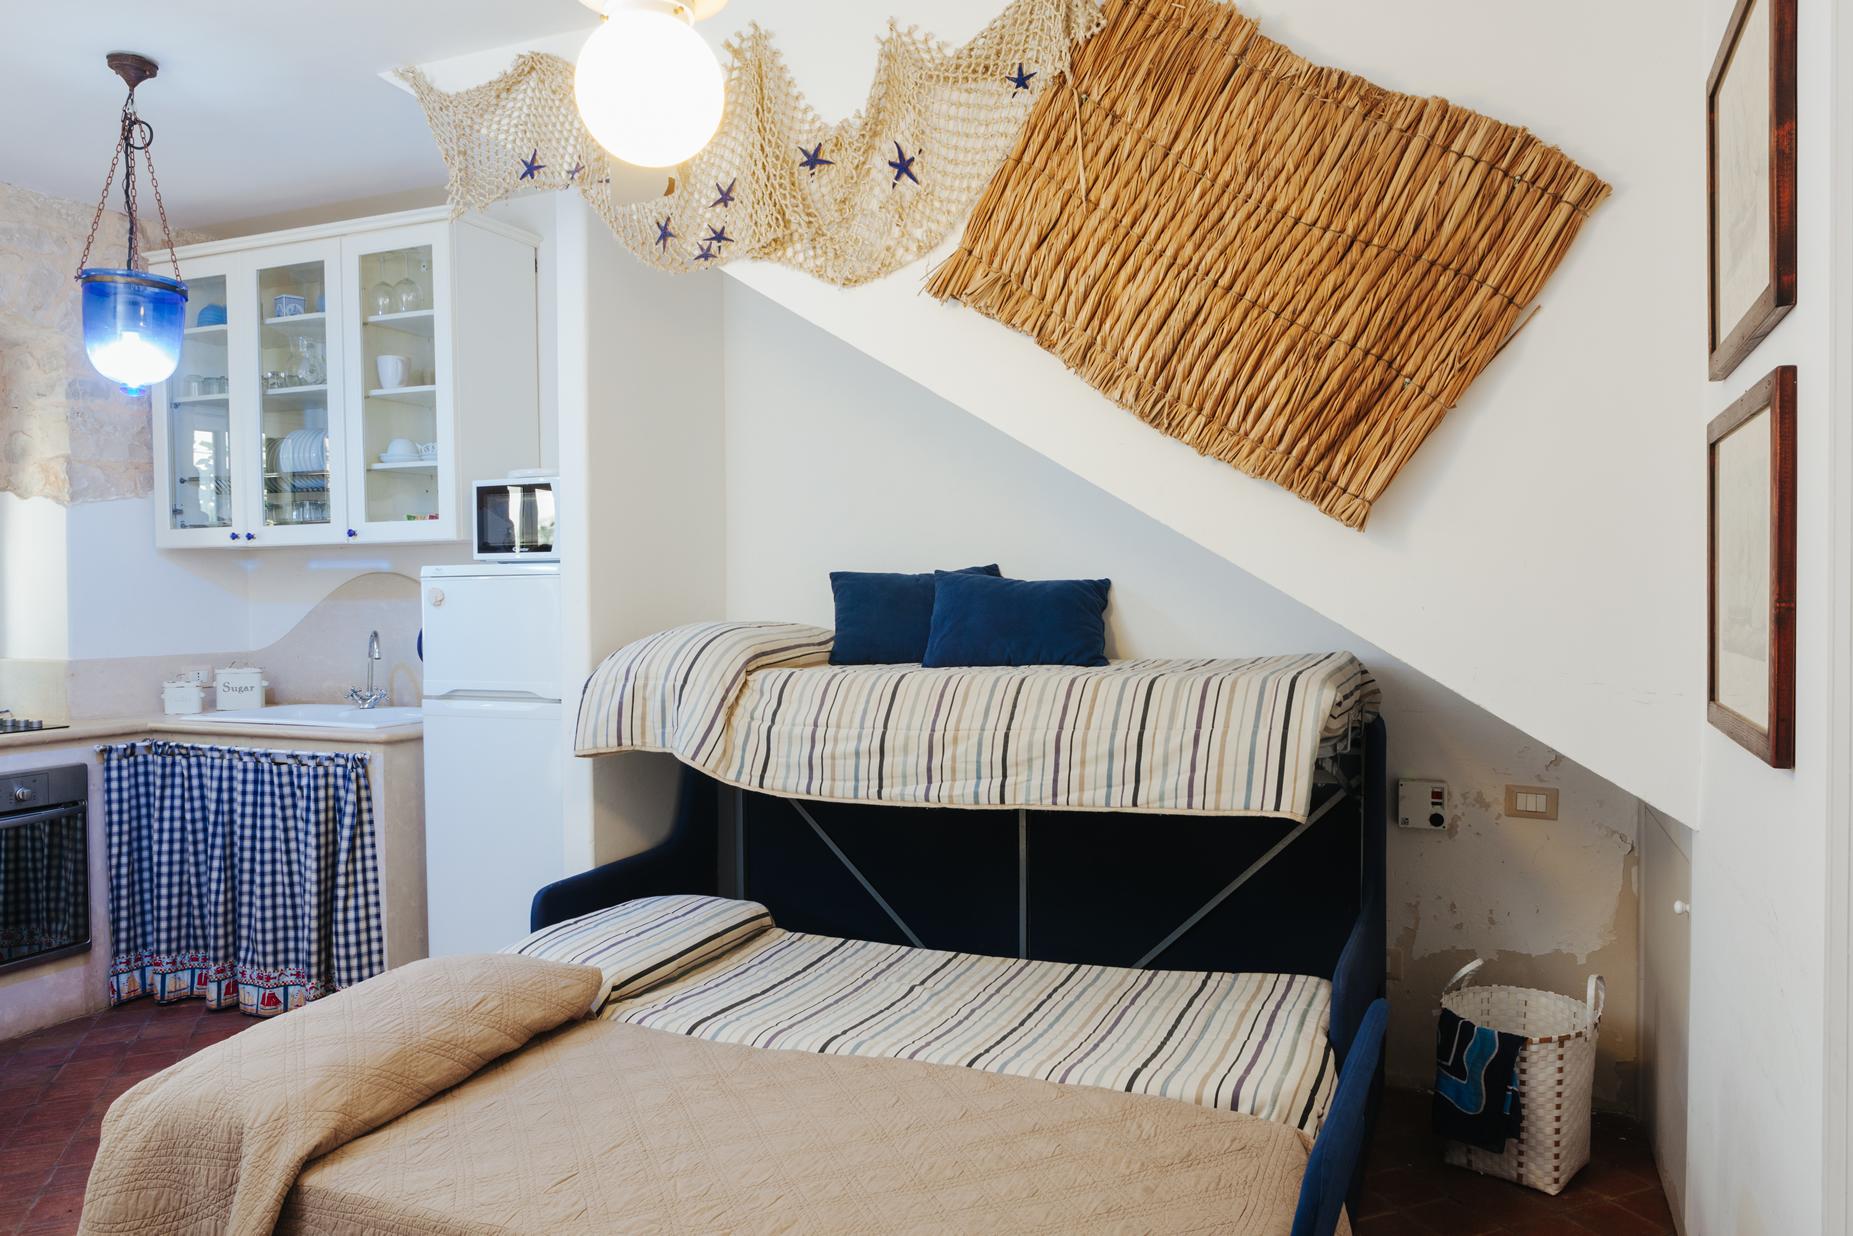 16sampieri-casa-vacanze-sicilia-appartamento-sicily-holiday-apartment-casa-del-pescatore-italia-italy.jpg